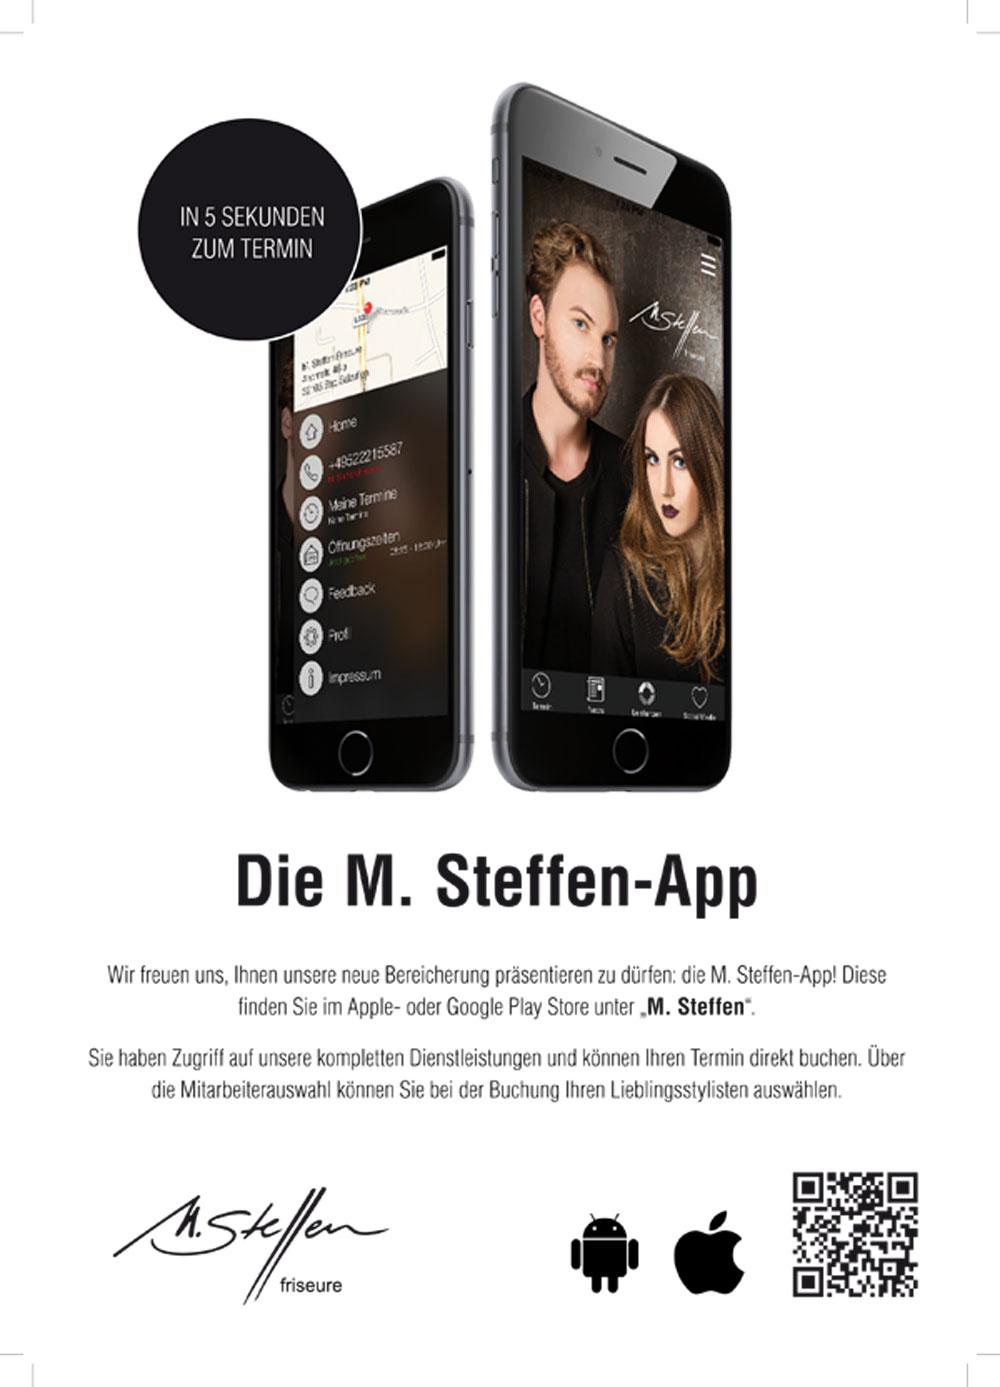 M. Steffen Friseure - APP